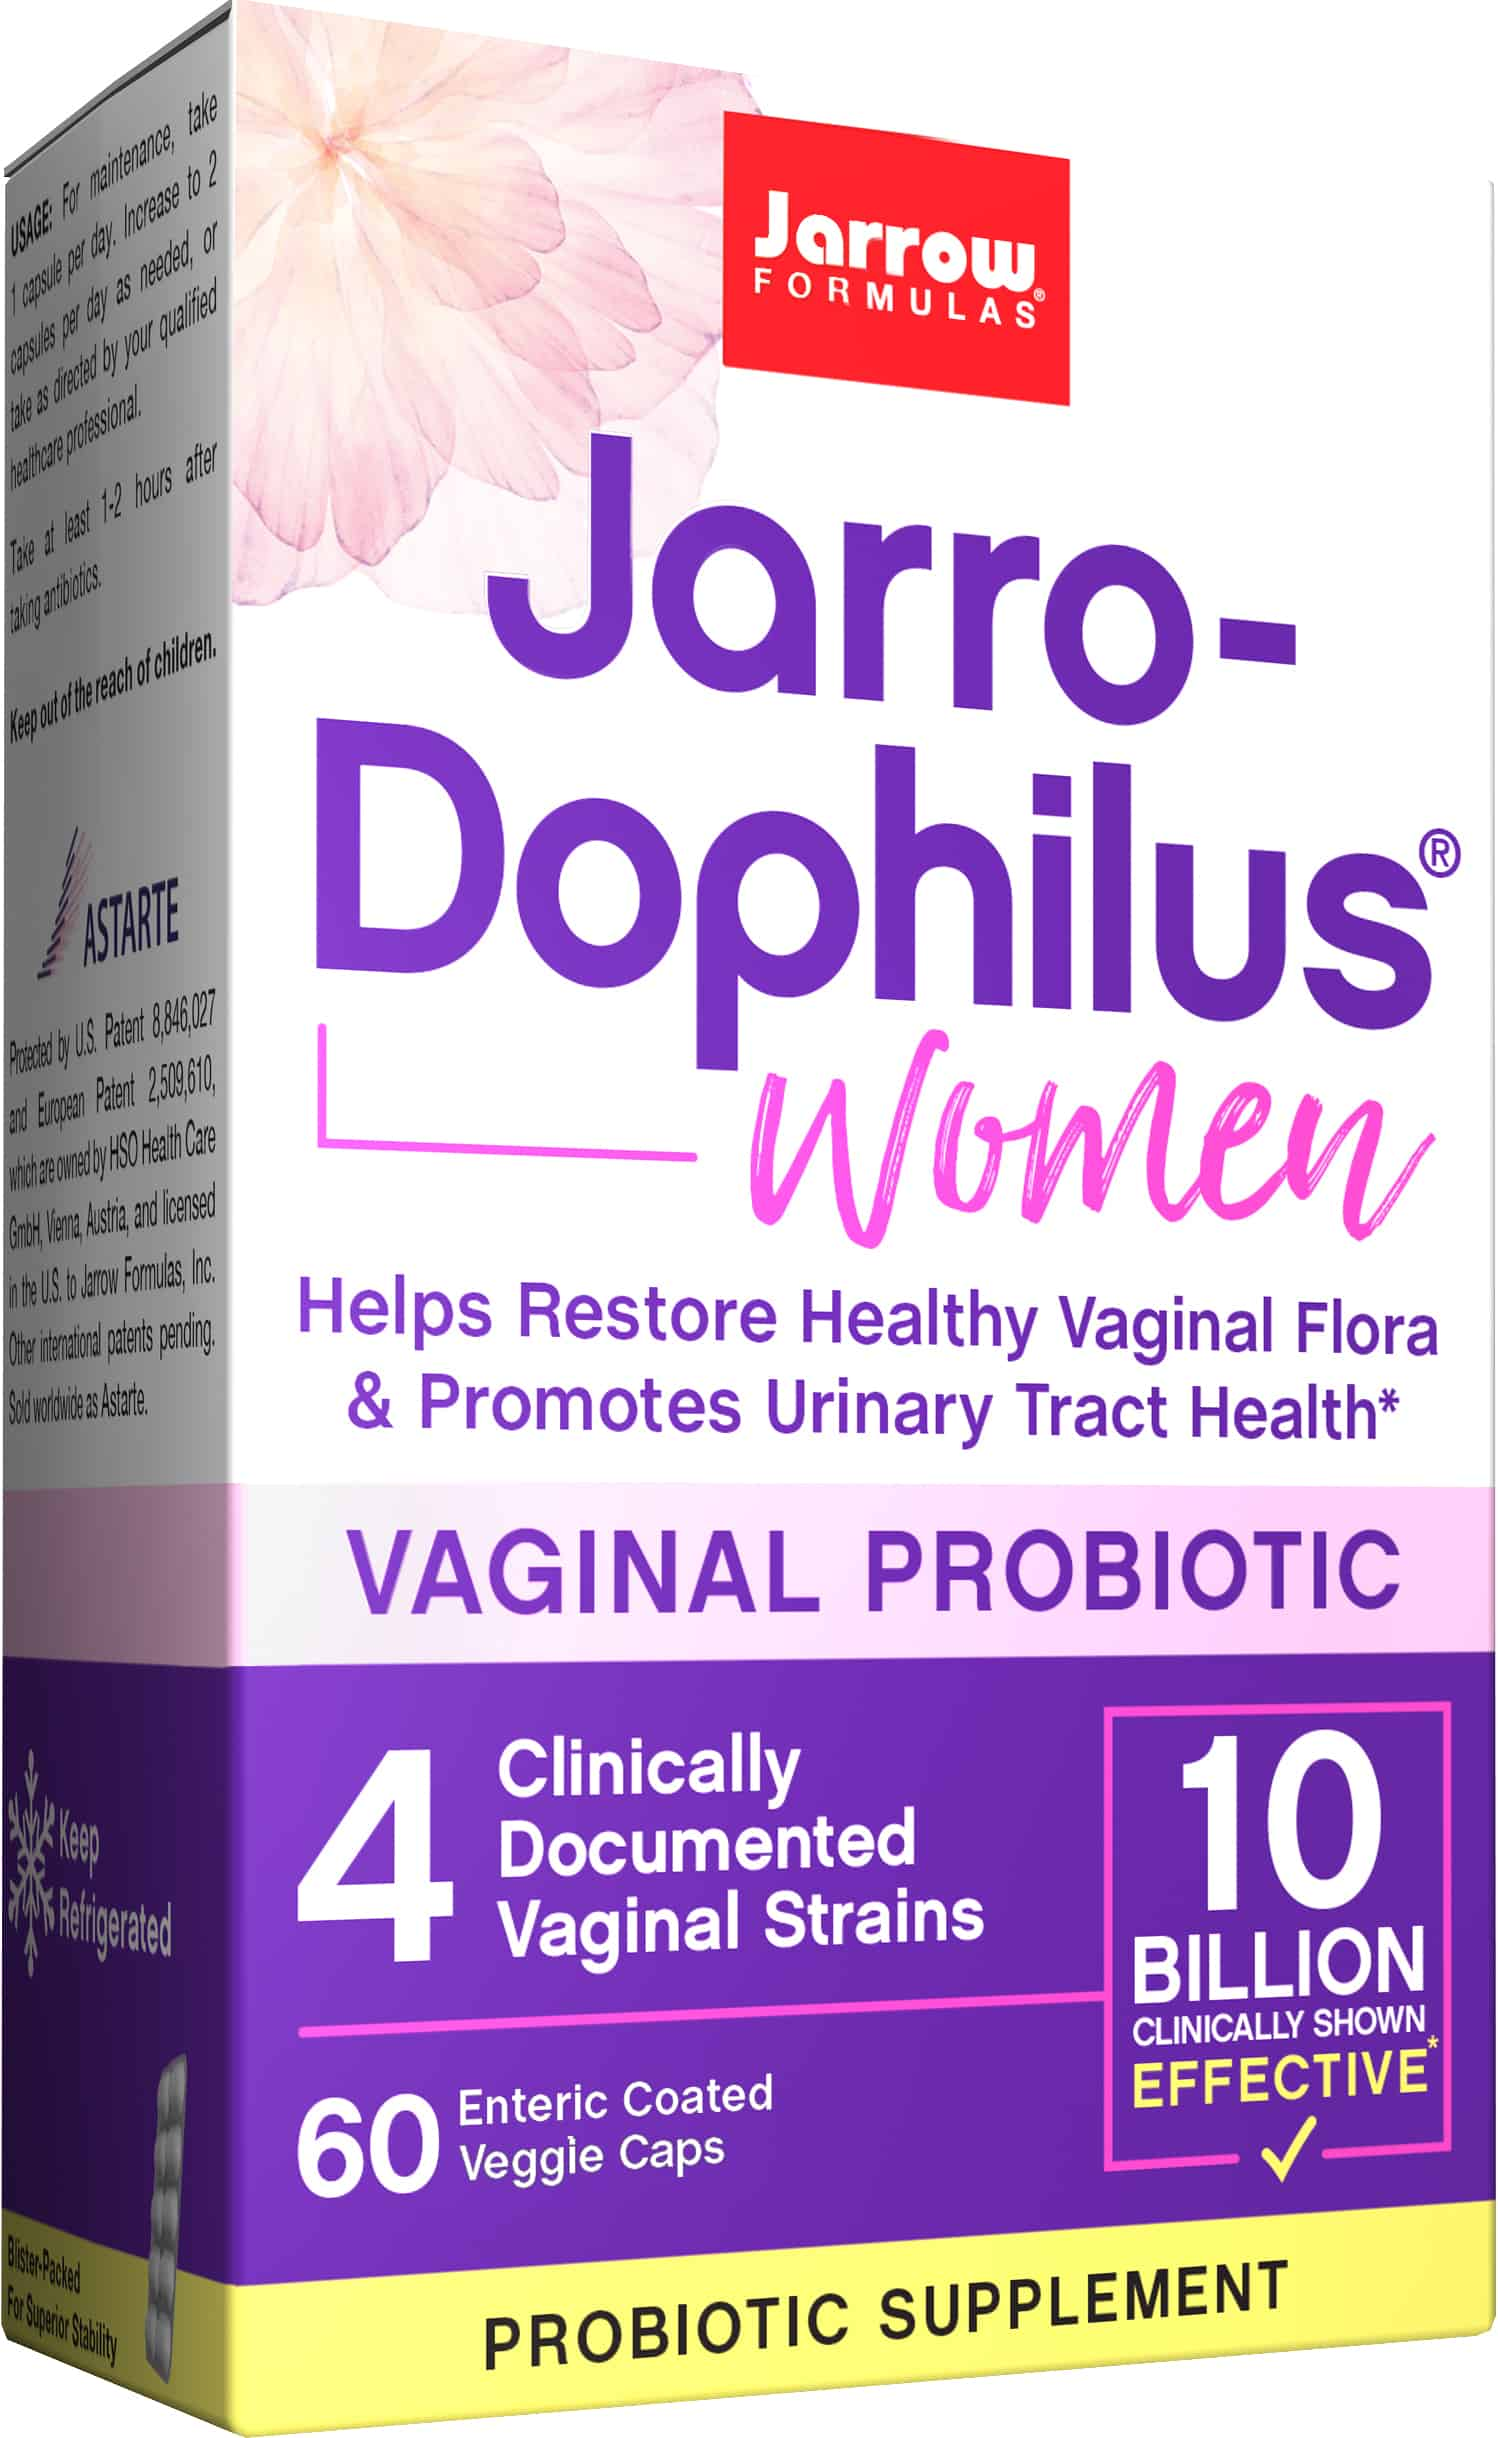 jarrow-women-probiotic-box